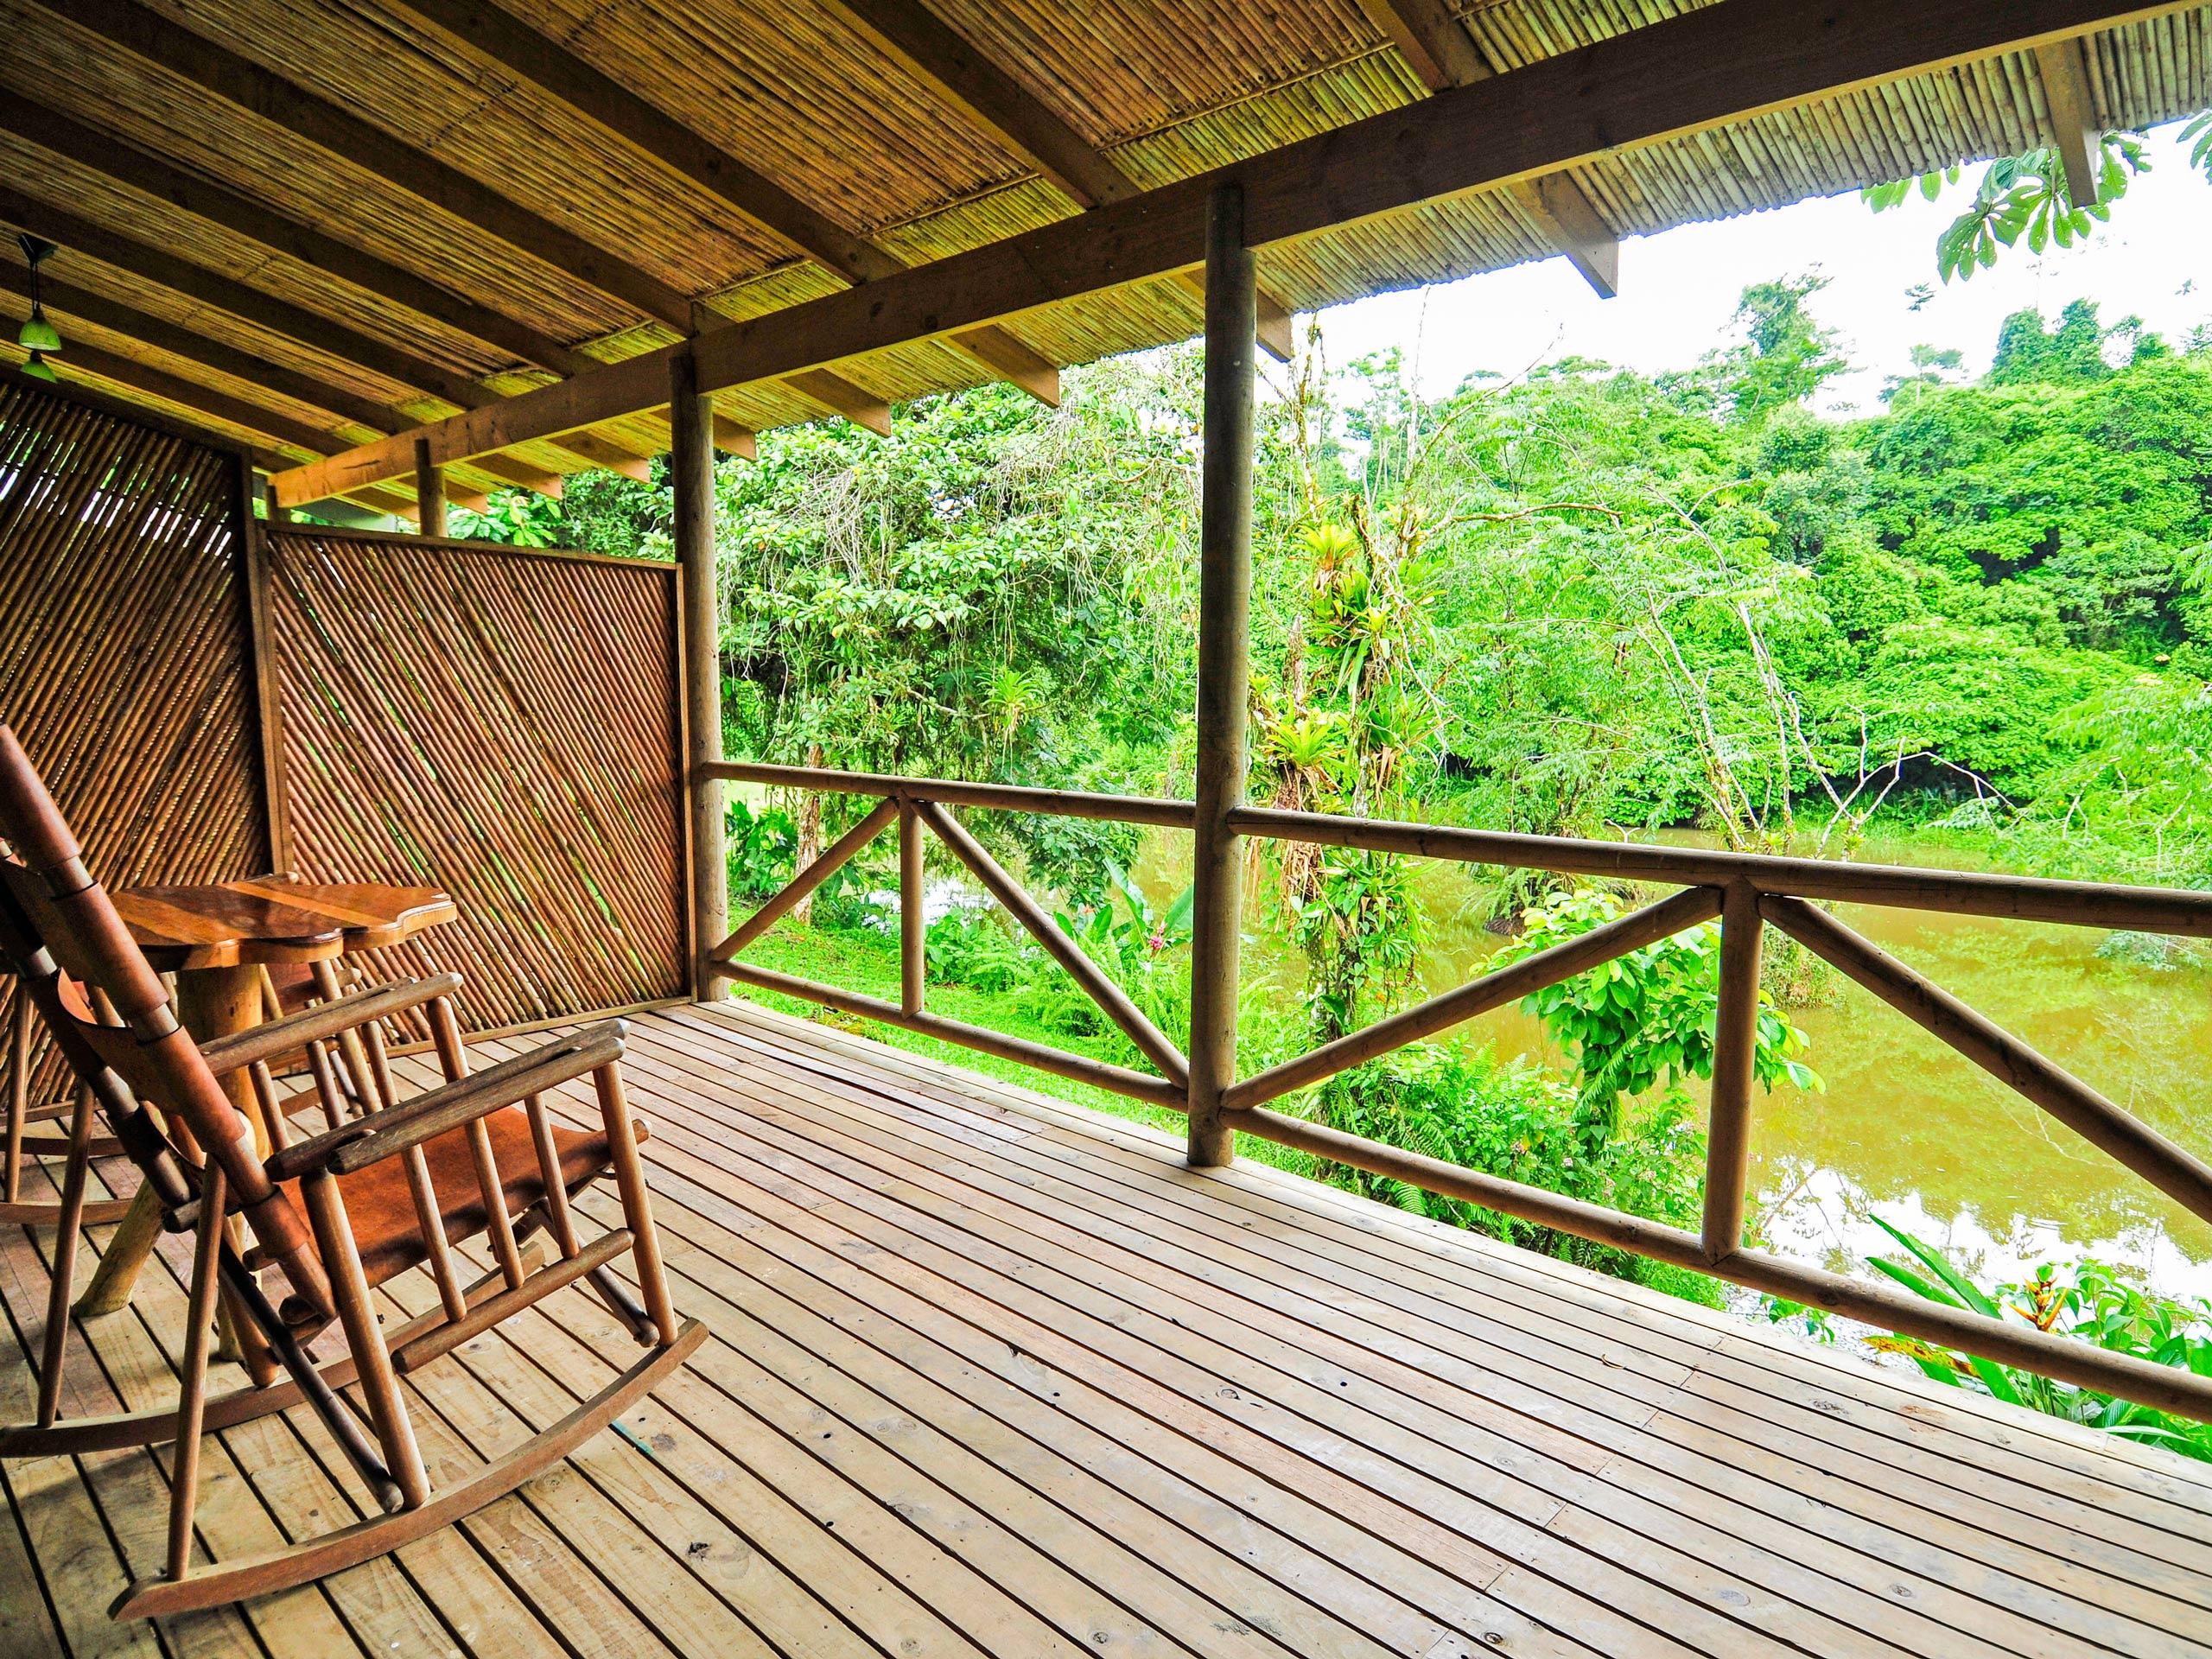 Rainforesf near the hotel